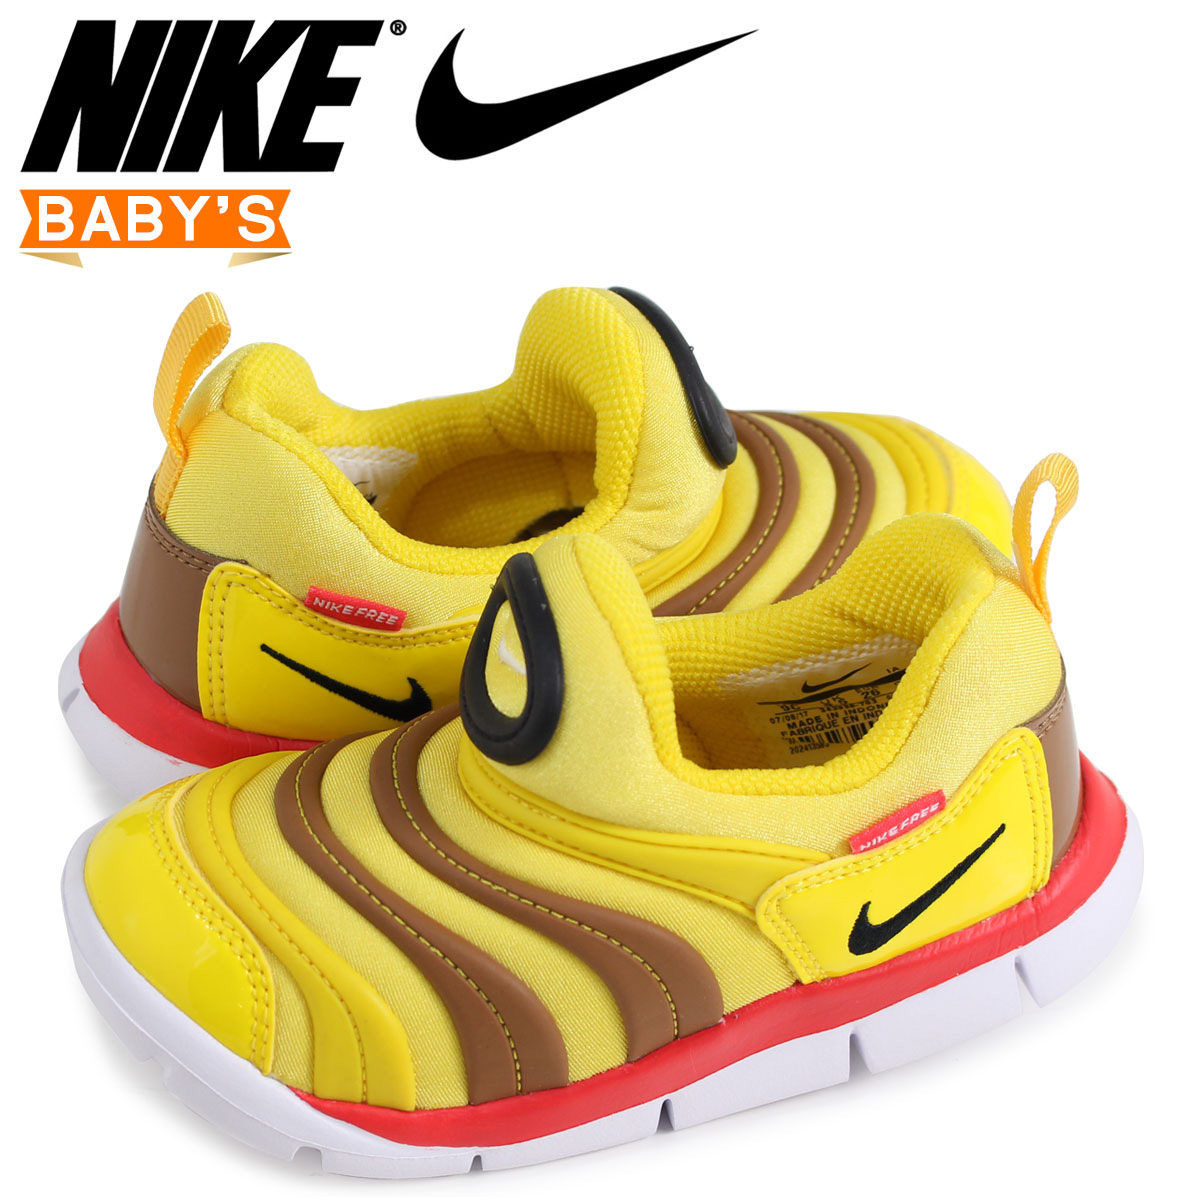 sneak online shop nike nike dynamo free baby sneakers dynamo free td 343 938 703 yellow 1 26. Black Bedroom Furniture Sets. Home Design Ideas